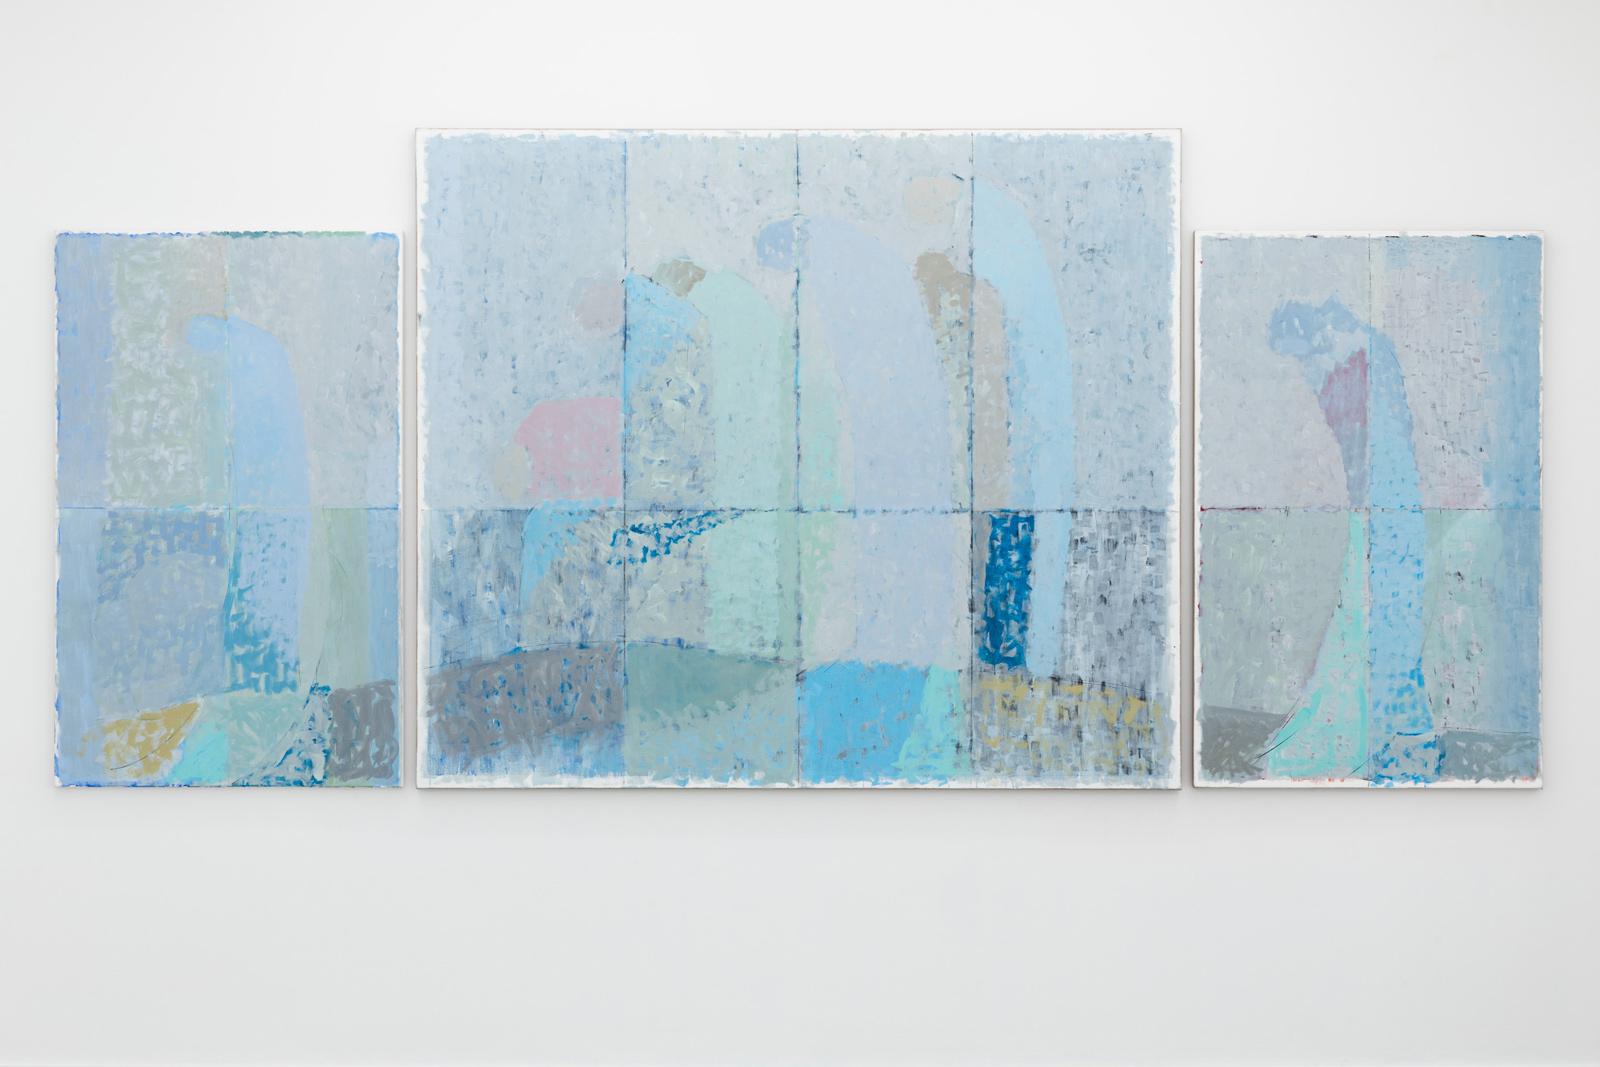 Pilegrimer, 2021, Egg tempera on canvas, 190 x 430 cm (in three parts)